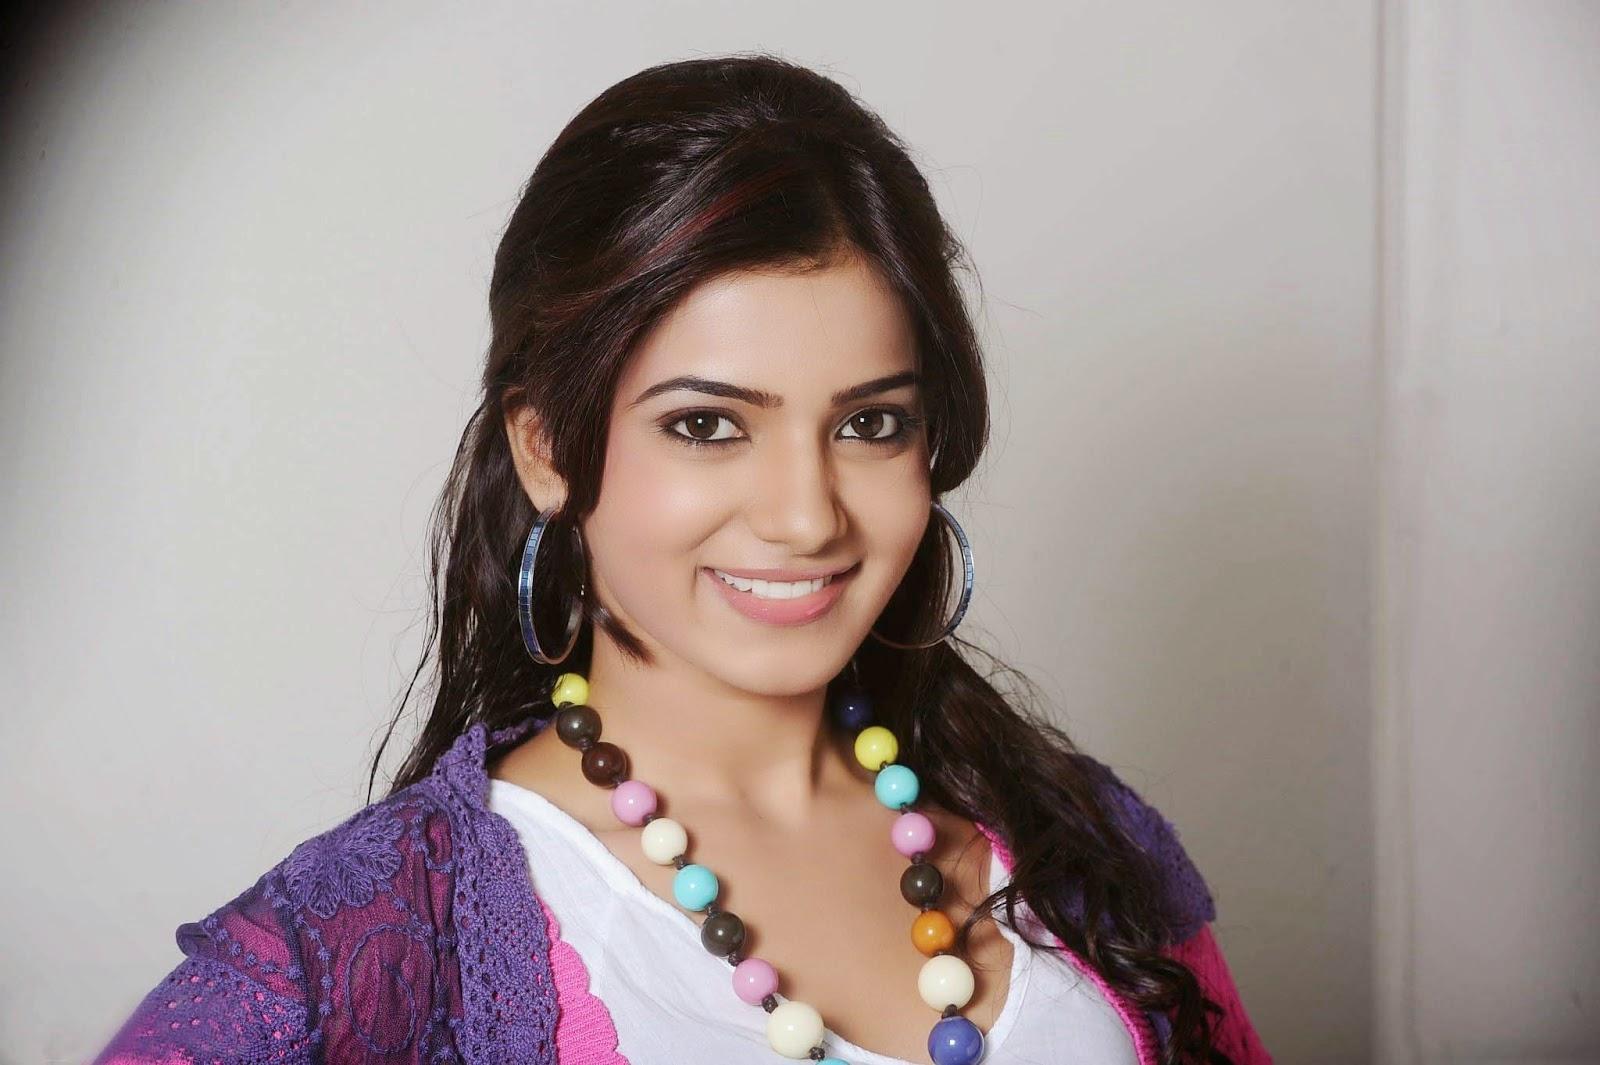 Samantha Ruth Prabhu HD wallpapers Free Download